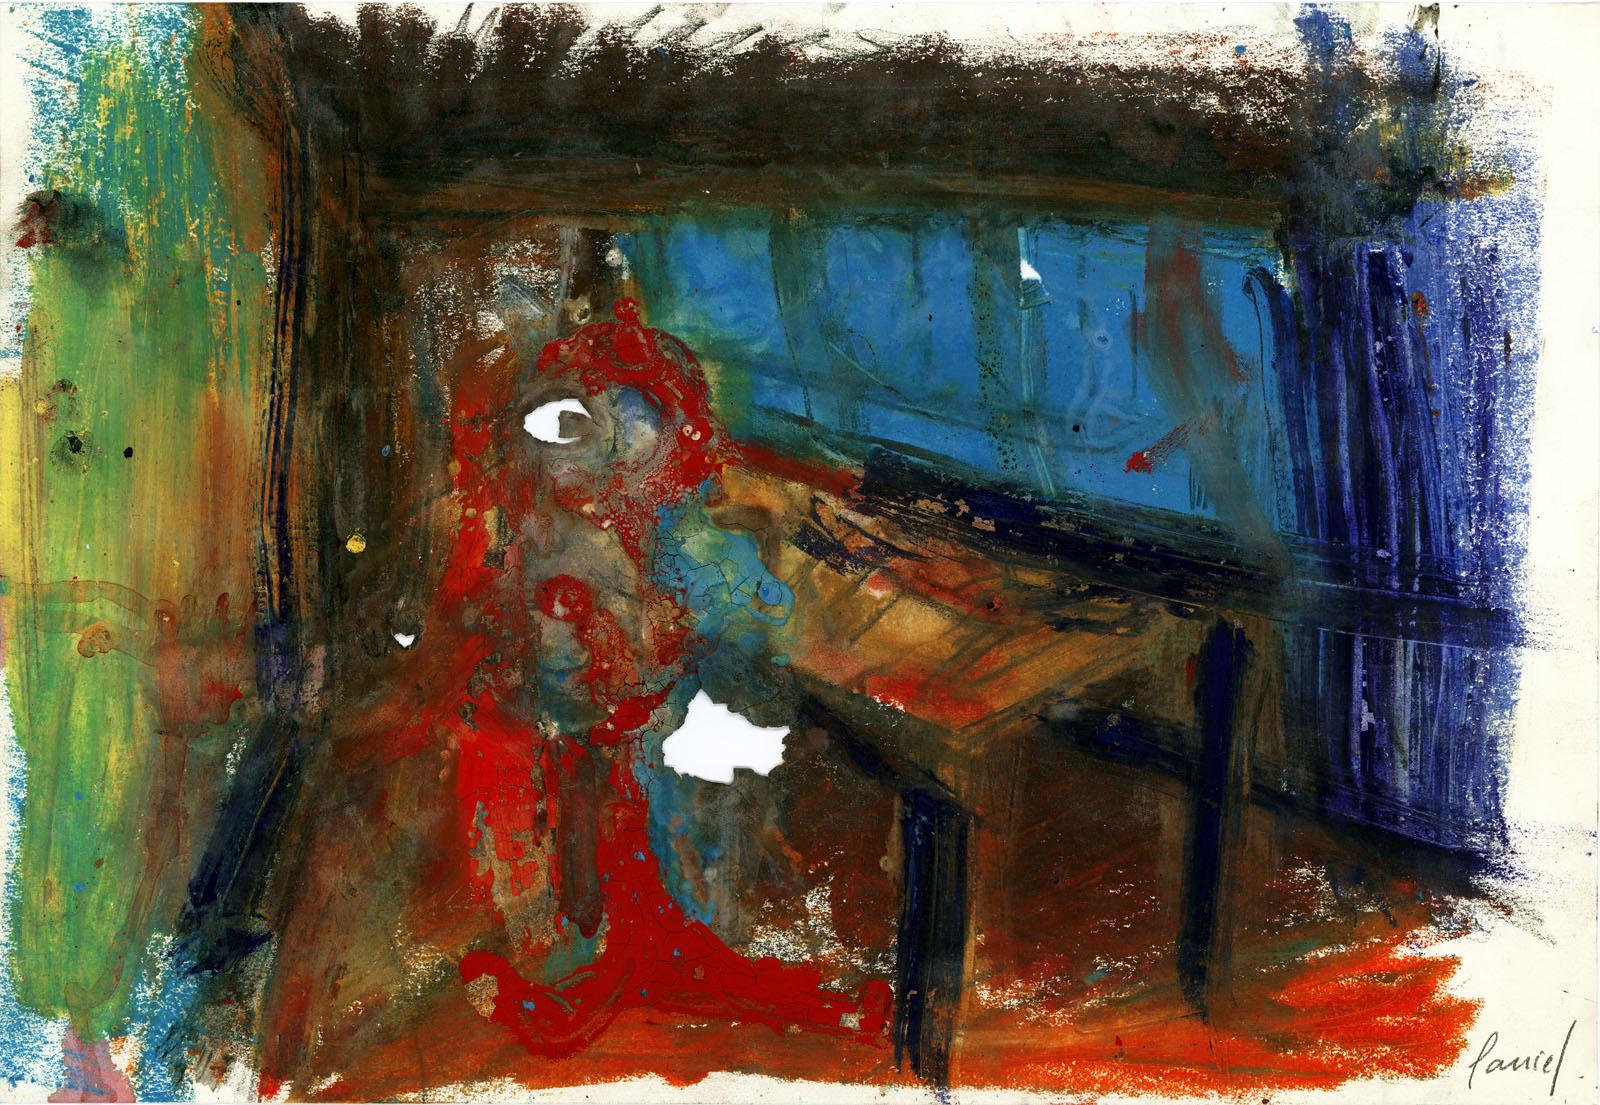 panies-danielvillalobos-spanish-painting-abstractexpressionism-19